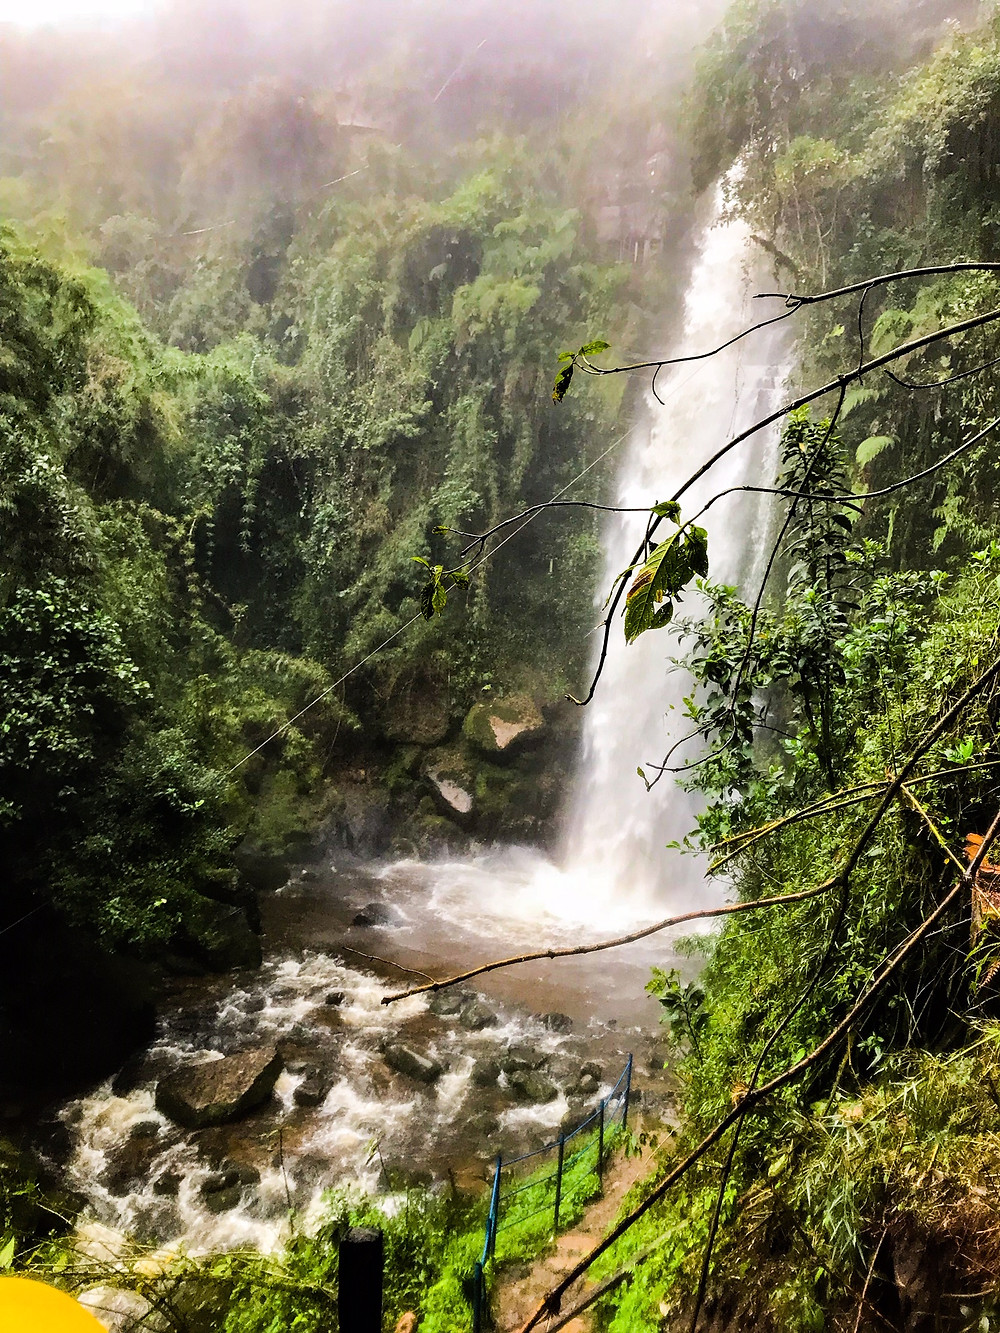 The La Chorrera Waterfalls